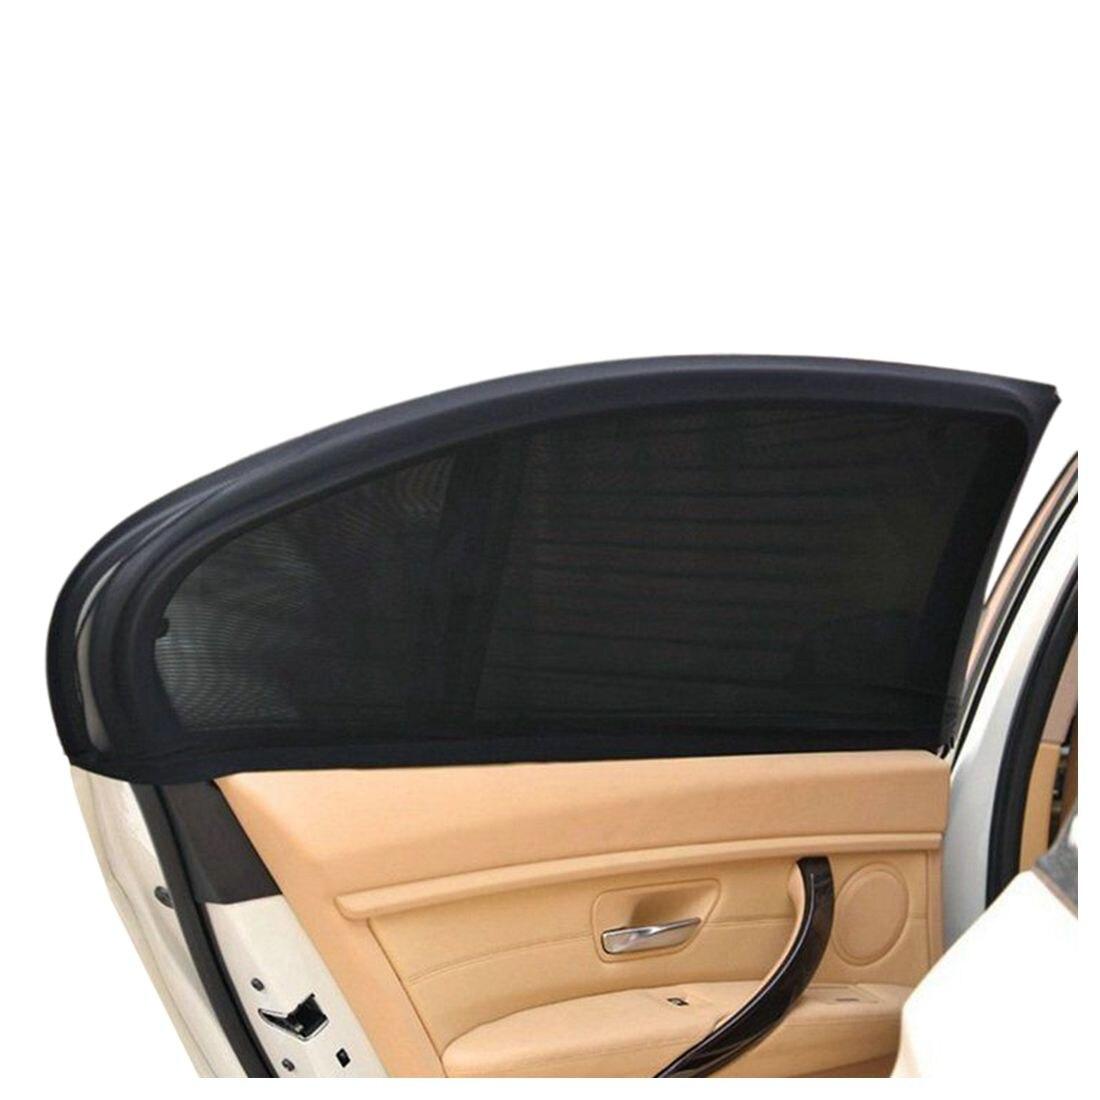 2 X Car Side Rear Window Sun Visor Cover Shield Sunshade UV Side ... b4b5b95c6ef